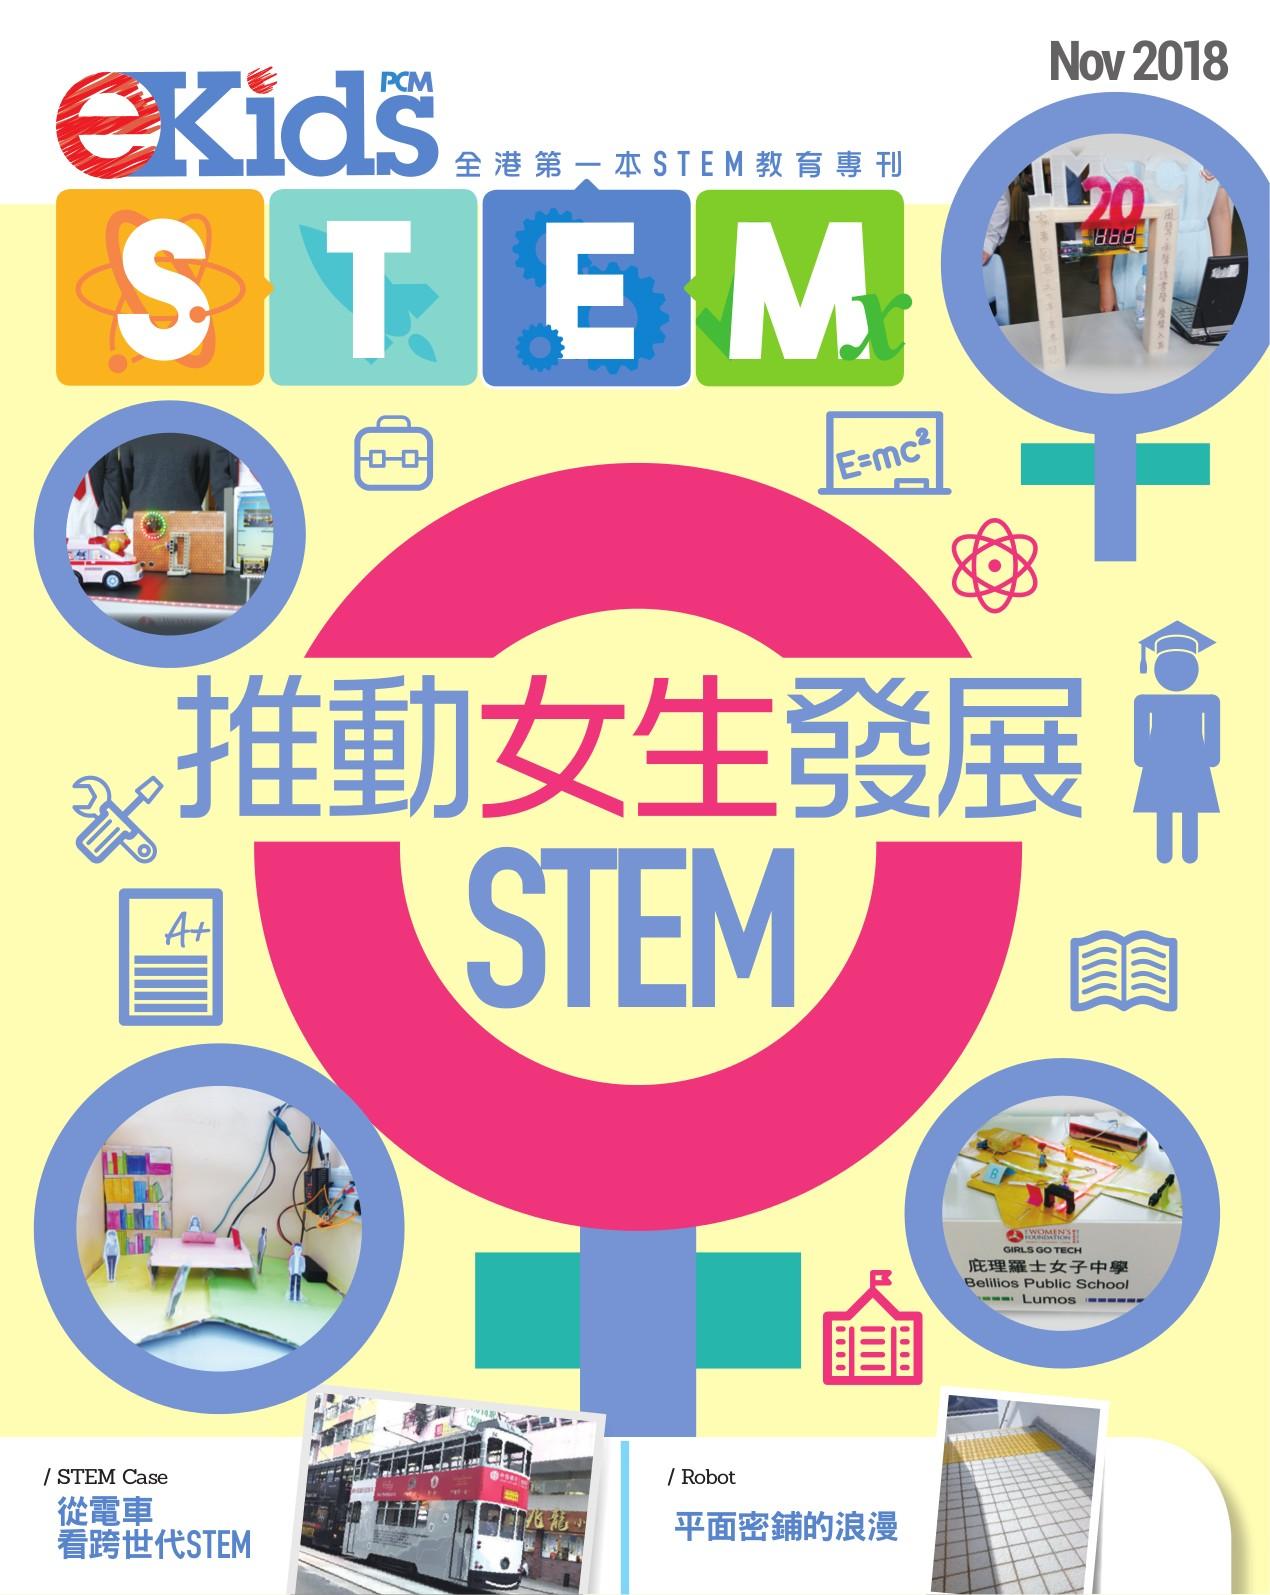 eKids STEM 2018-11月号